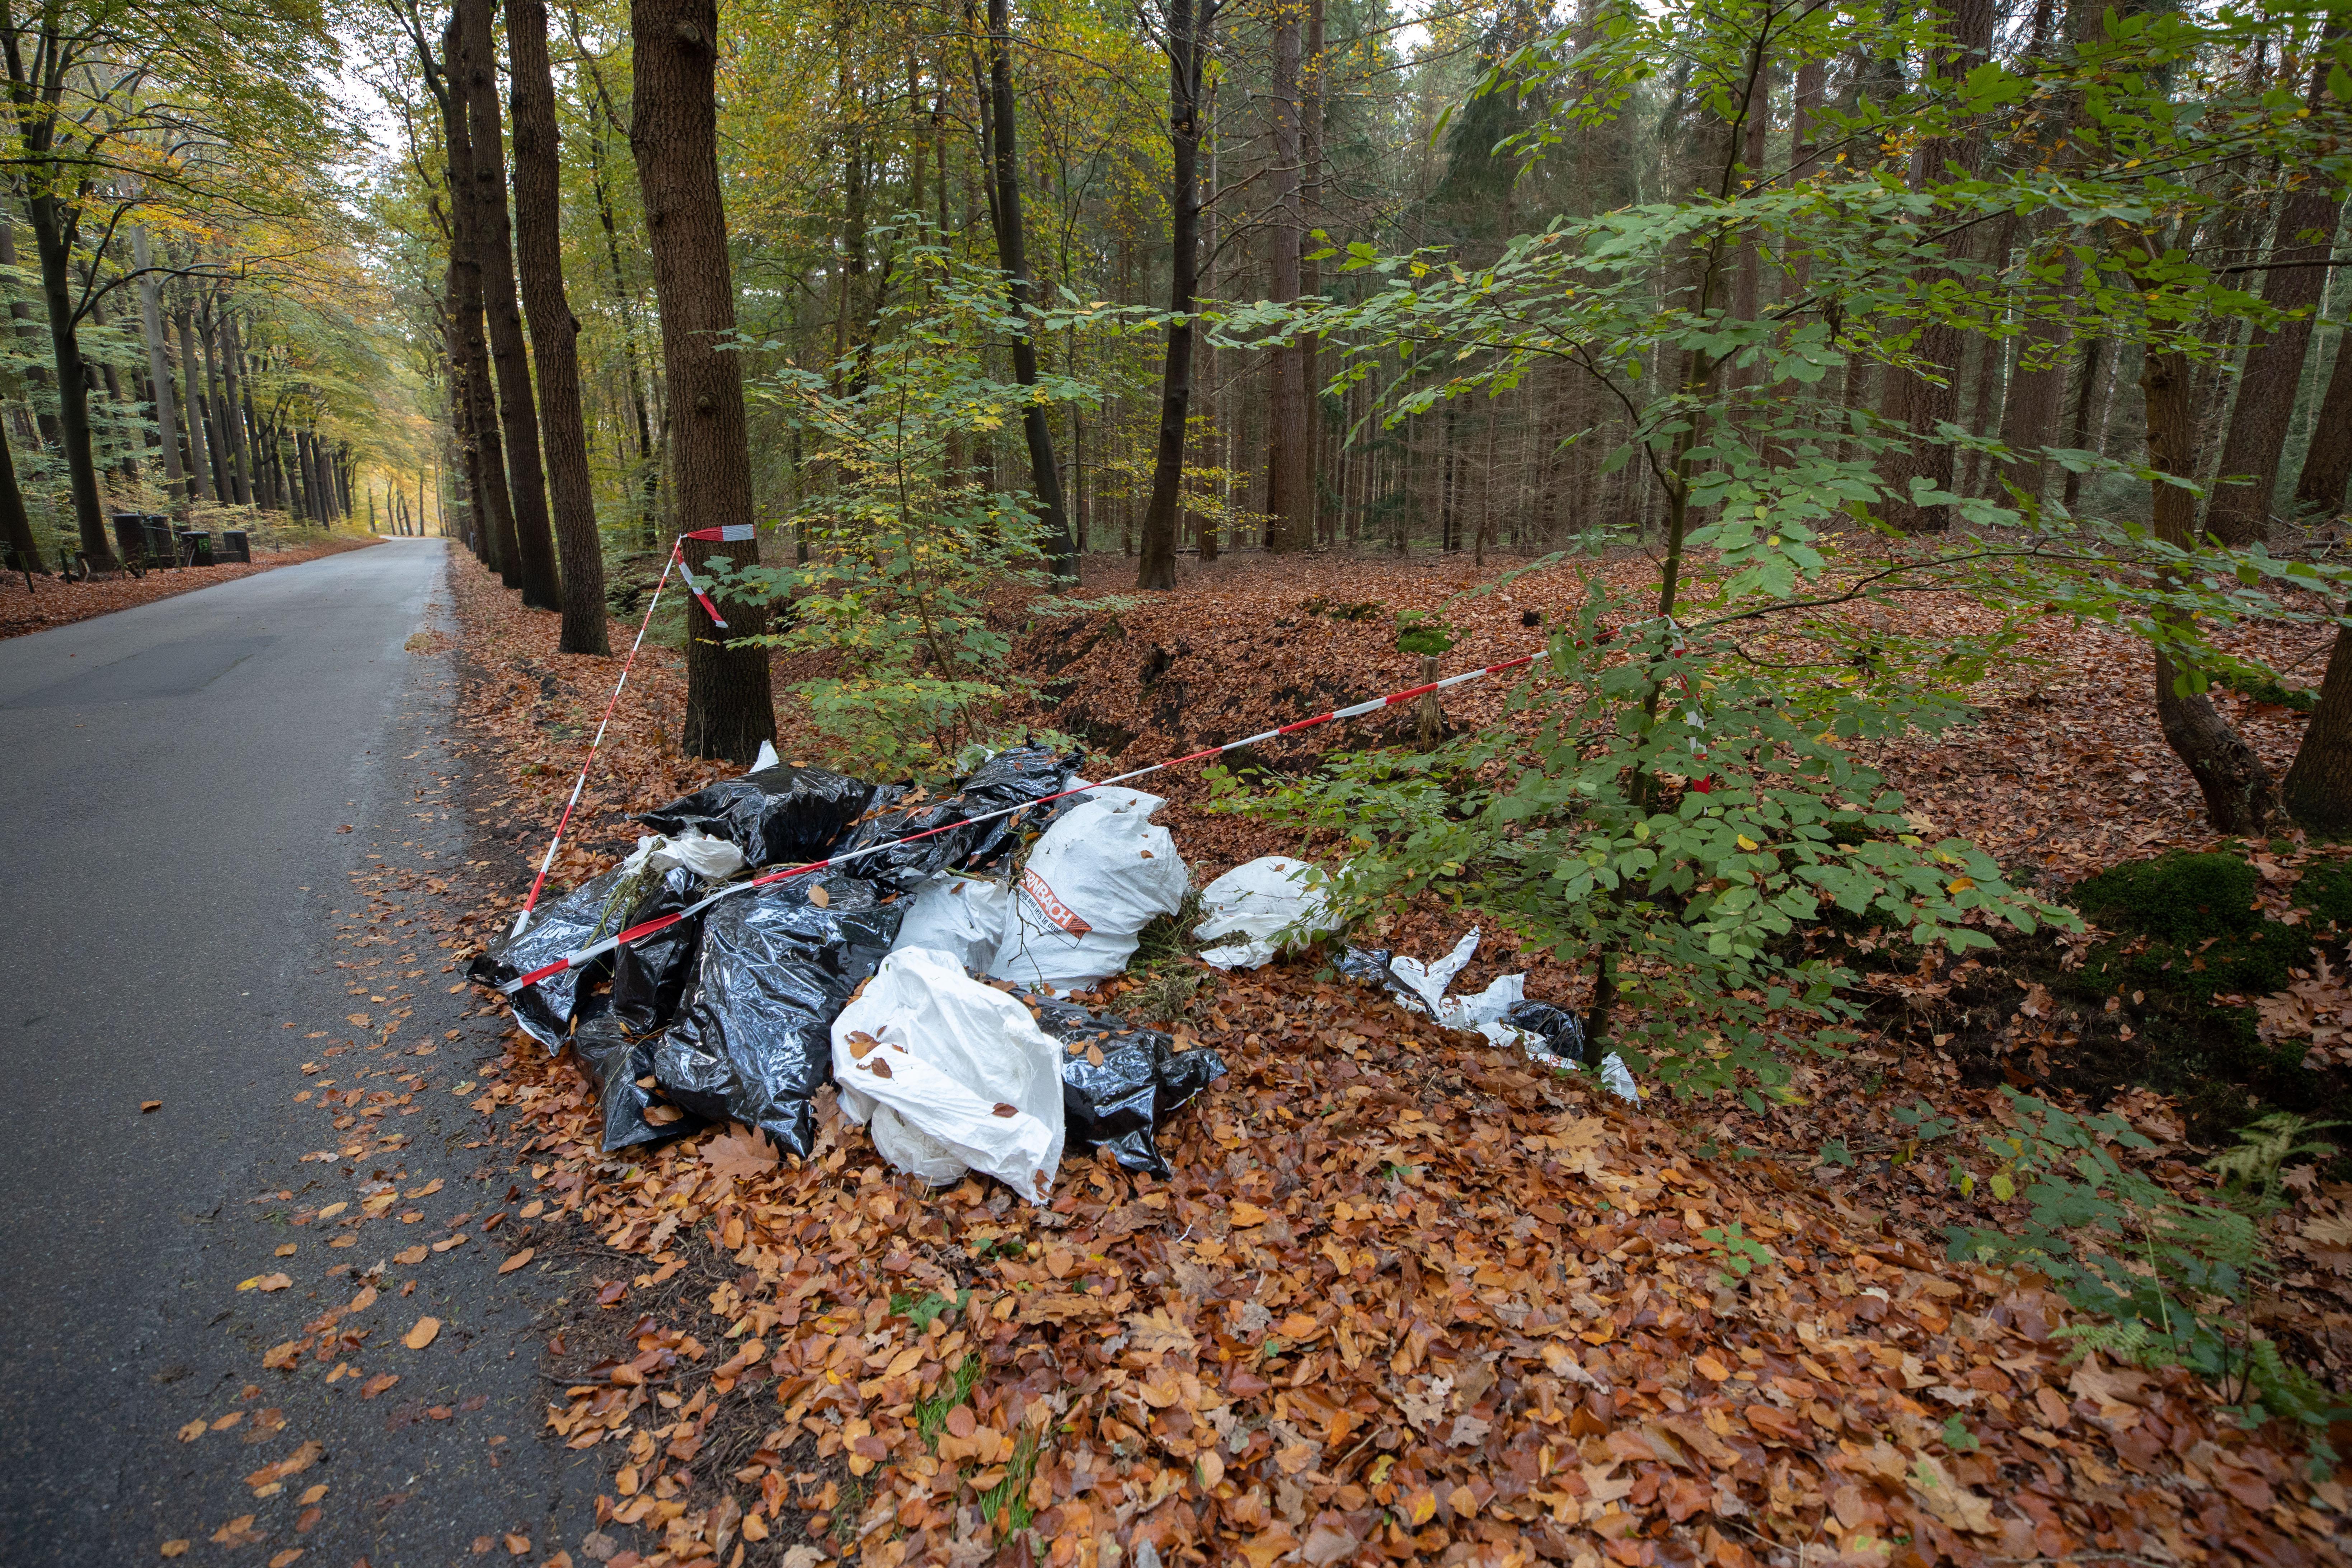 Circa dertig zakken wietafval gedumpt in natuur Lage Vuursche